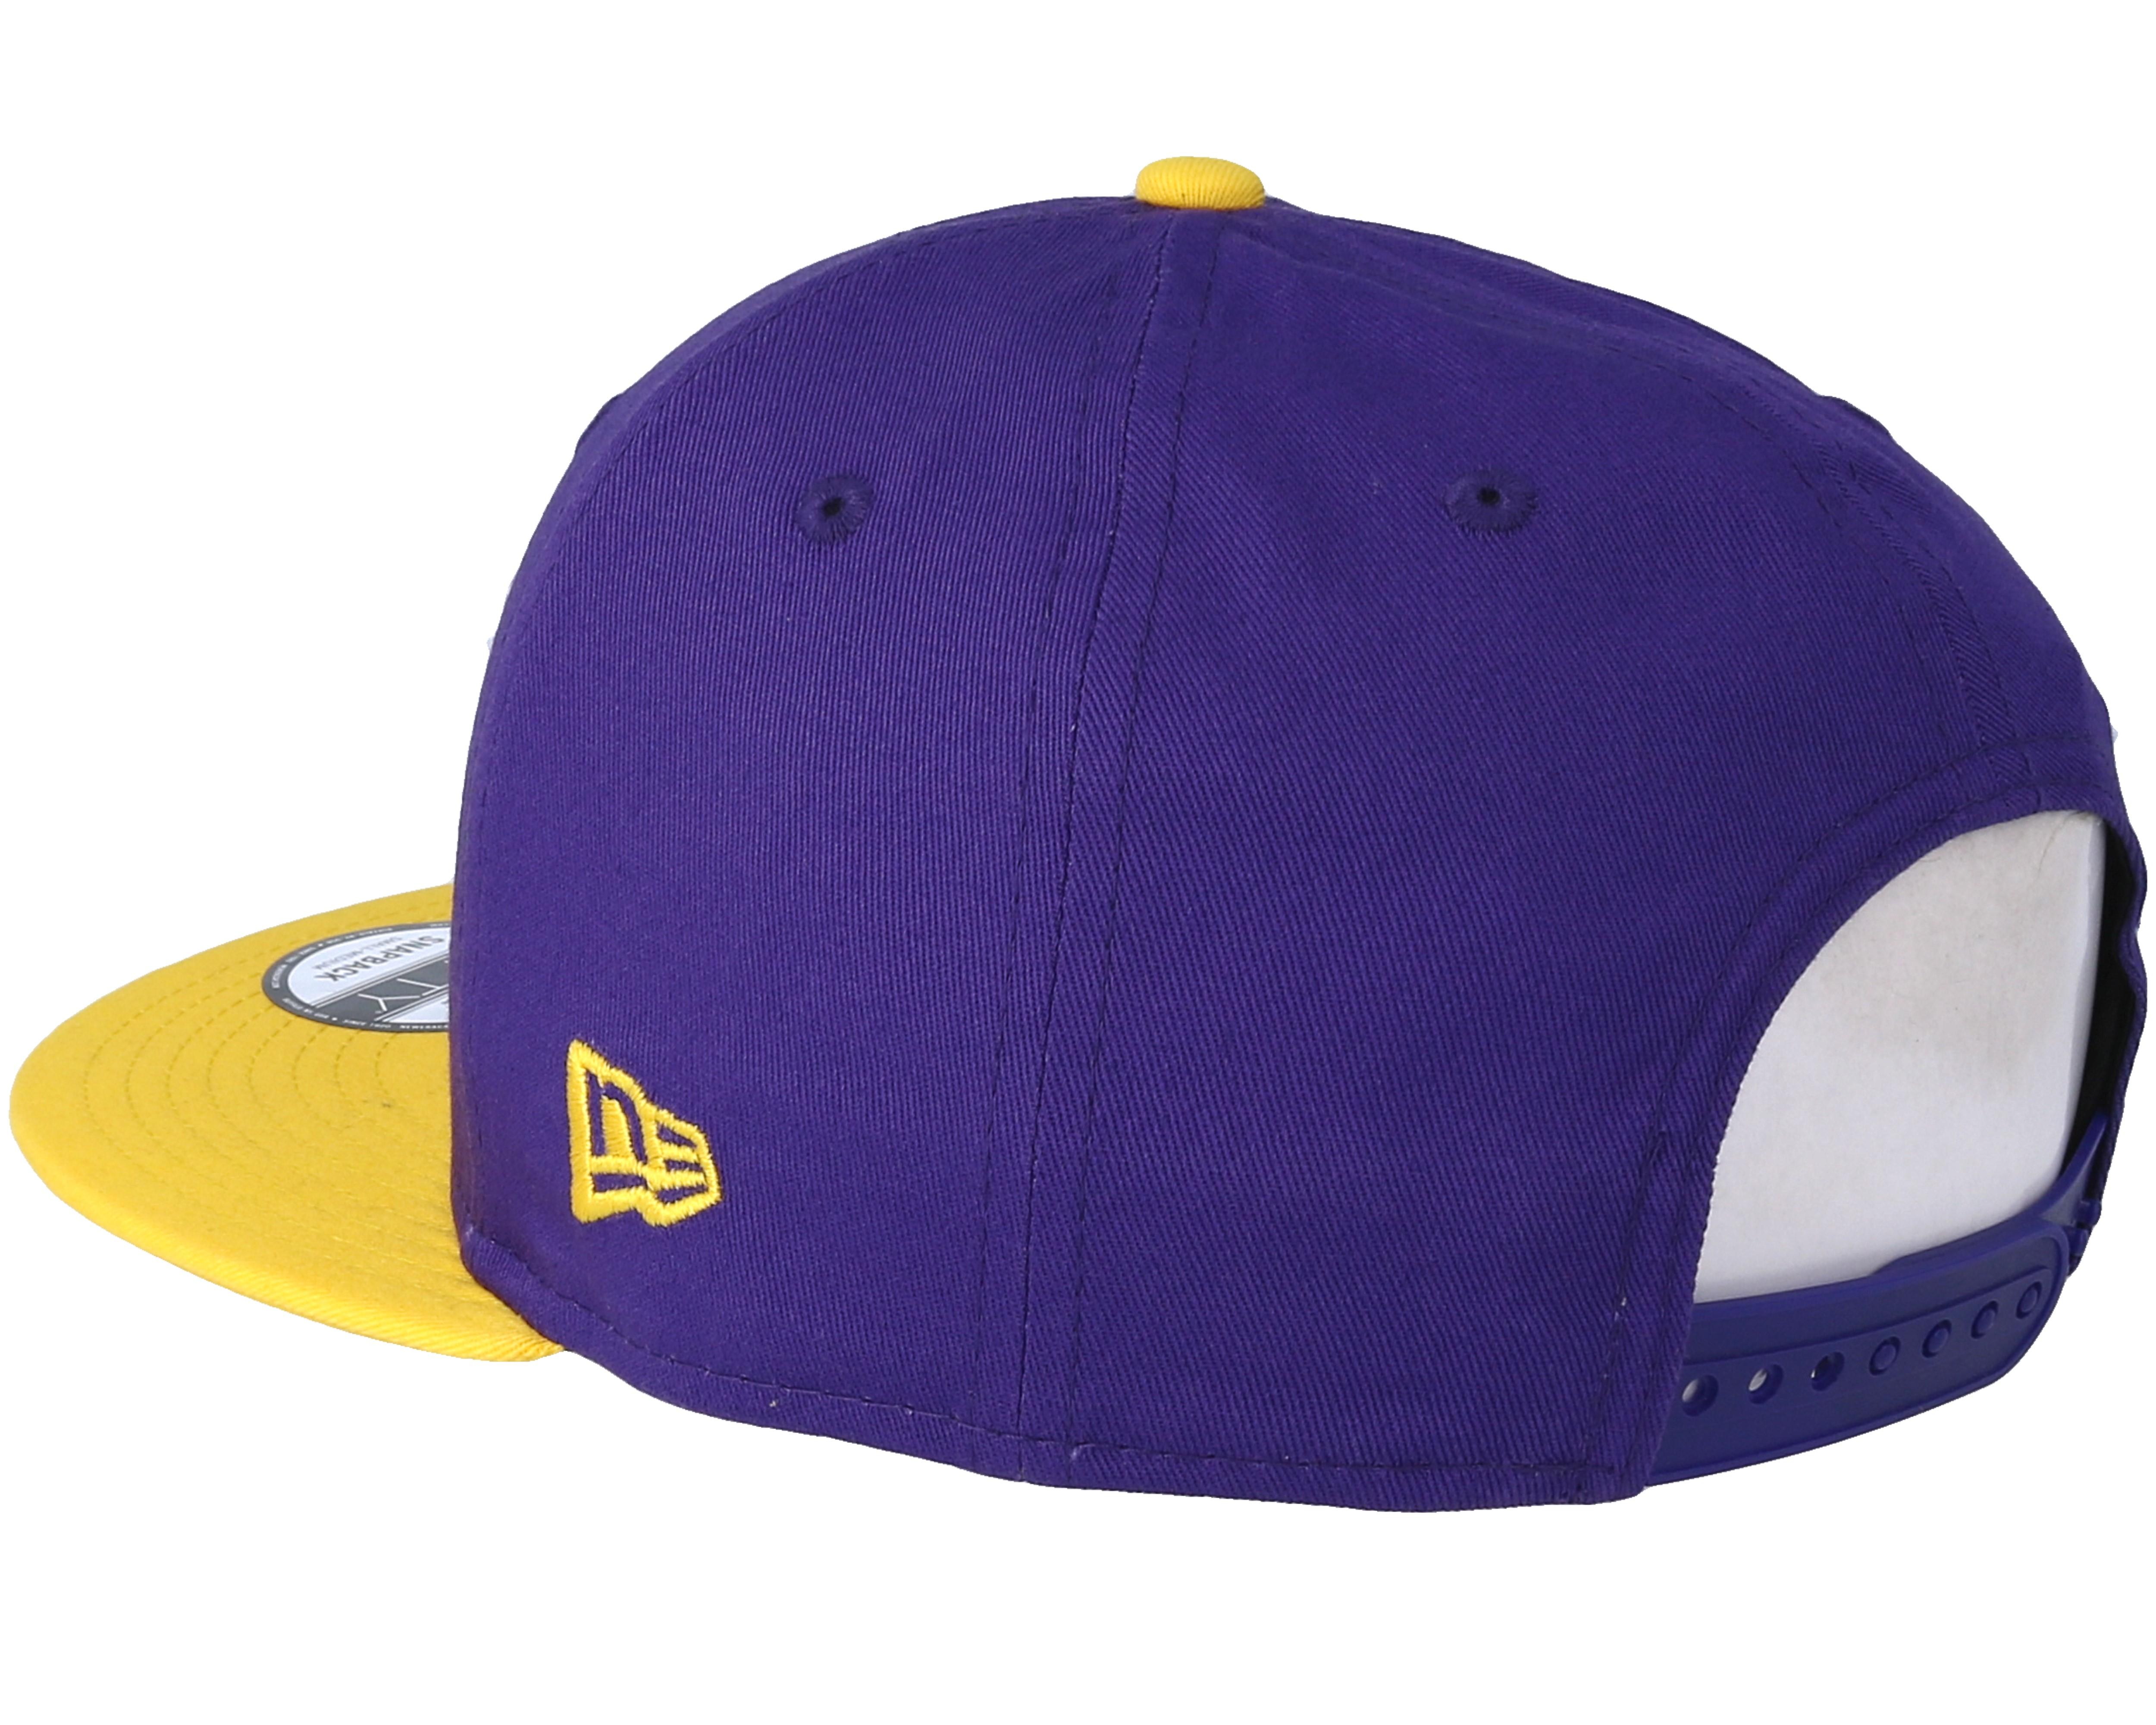 los angeles lakers 9fifty purple snapback new era cap. Black Bedroom Furniture Sets. Home Design Ideas